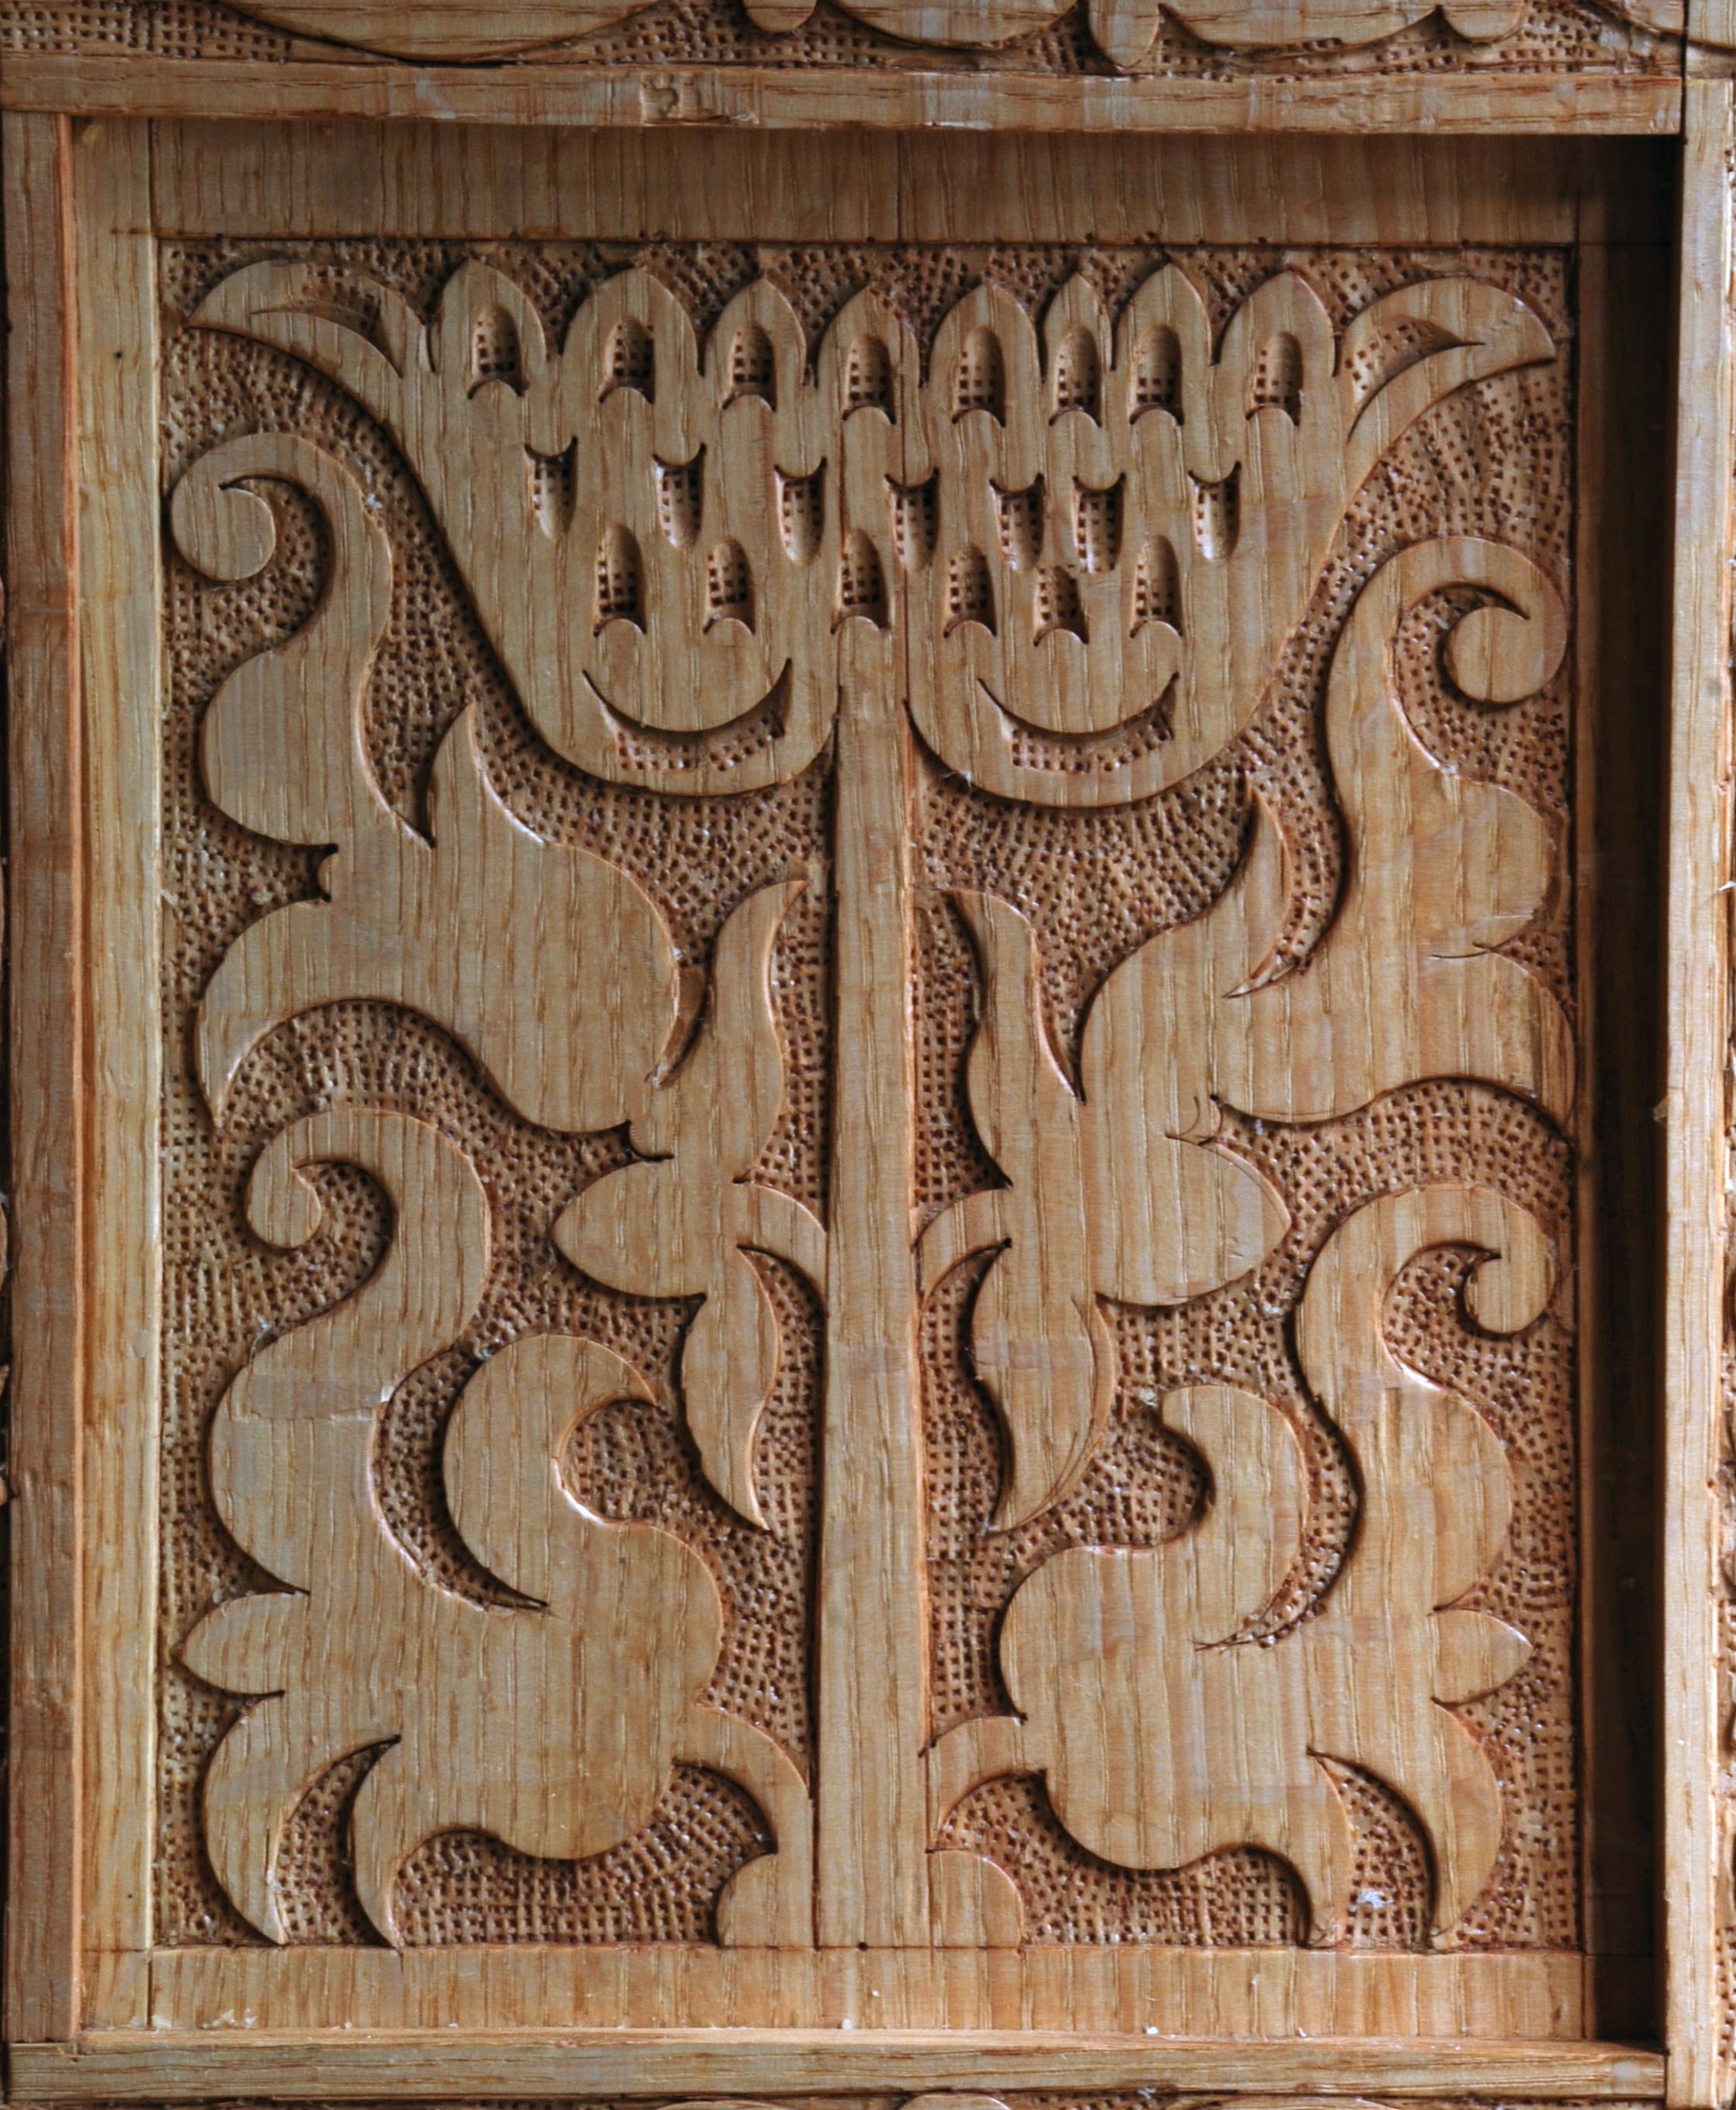 Wood carving designs furniture - Wood Carving Designs Furniture 52